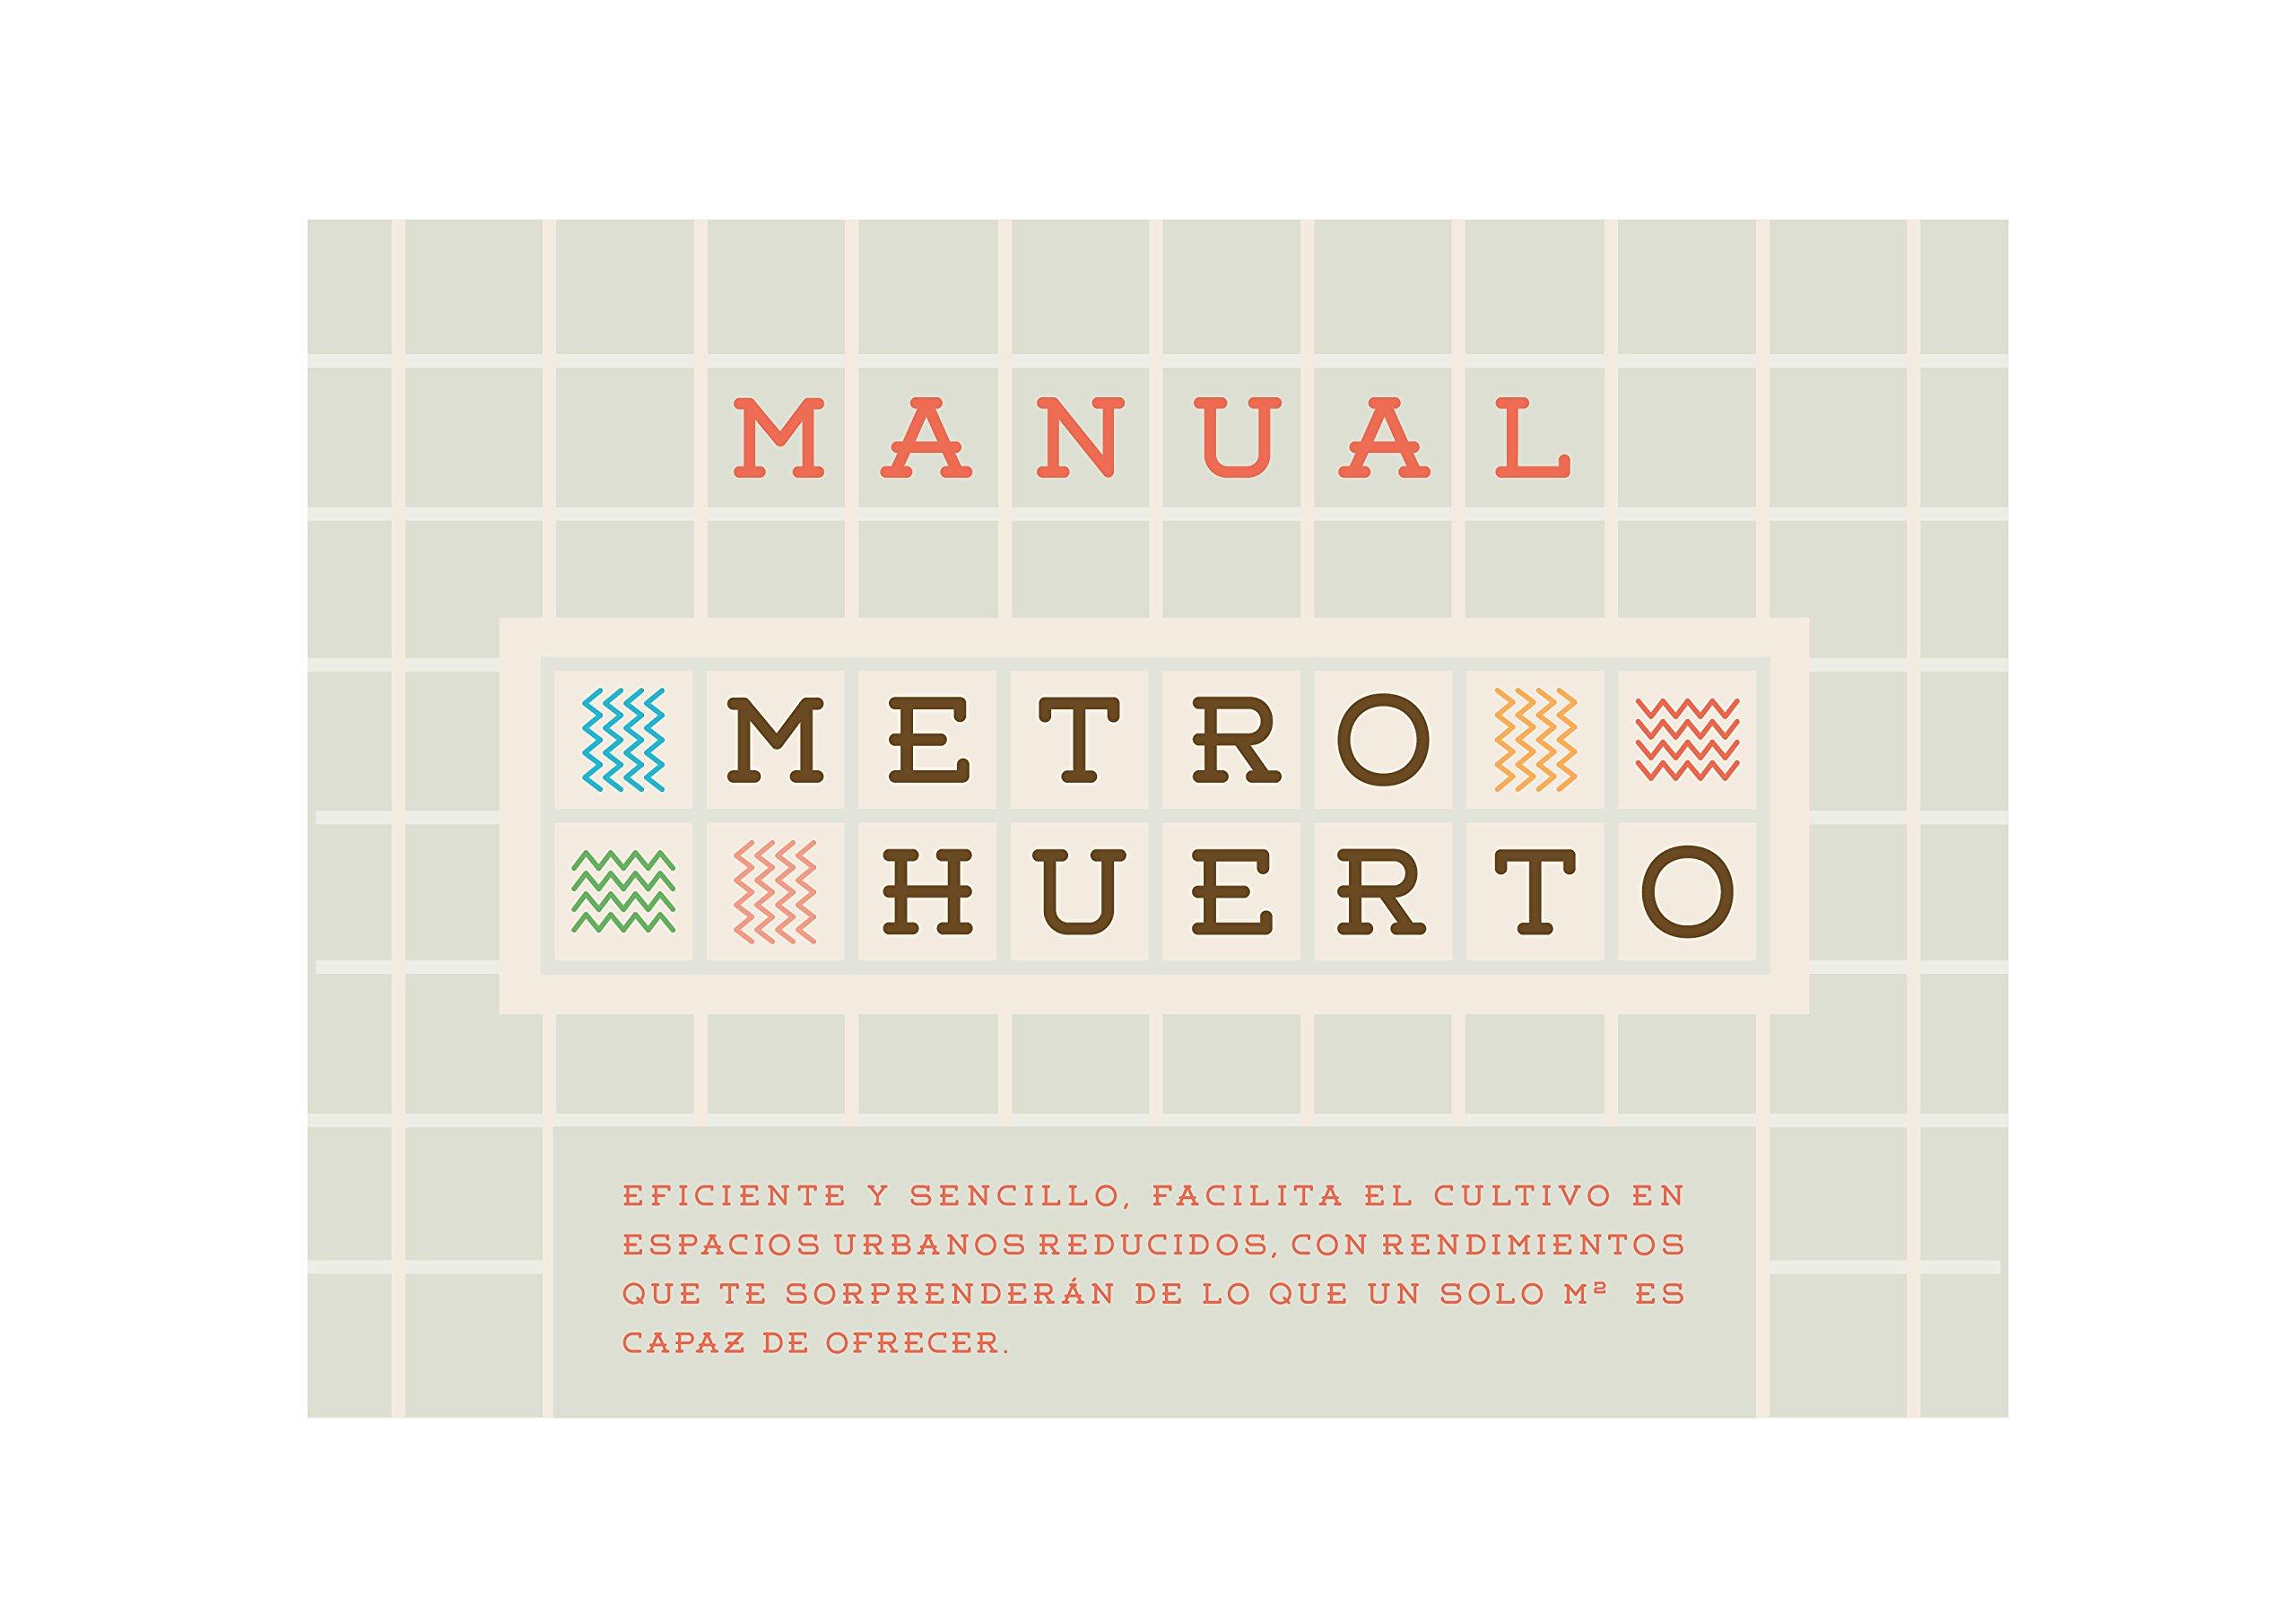 Saco Balconera mini Mh (50x20x20cm) par Huerto Urbano + Manual ...